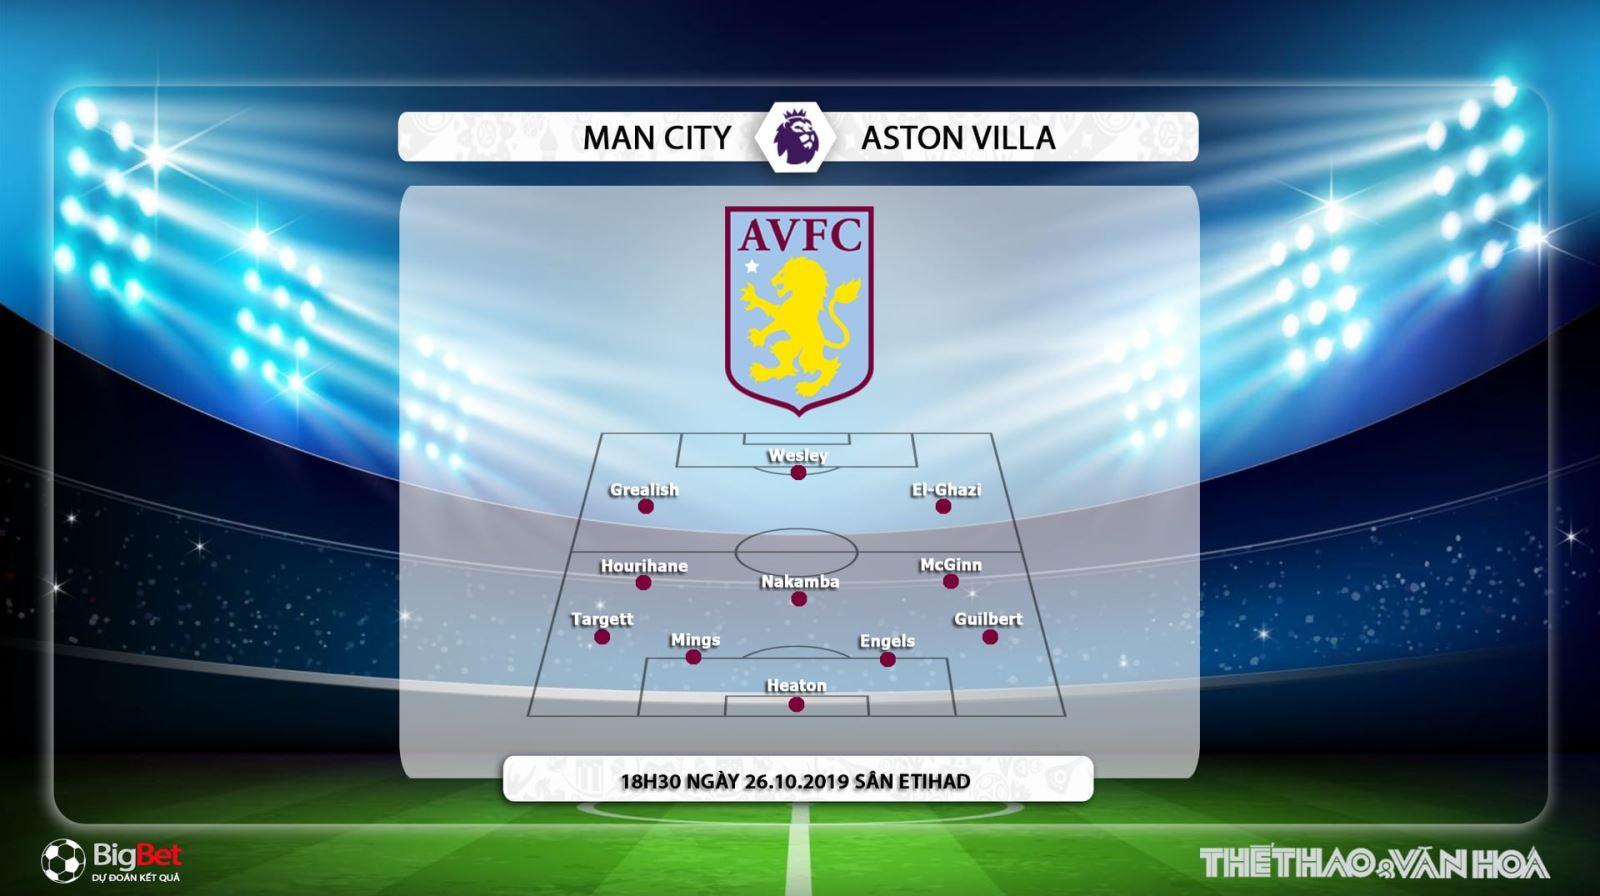 Man City, Aston Villa, soi kèo bóng đá, trực tiếp Man City vs Aston Villa, trực tiếp bóng đá, K+, K+PM, K+PC, xem bóng đá trực tuyến, bóng đá